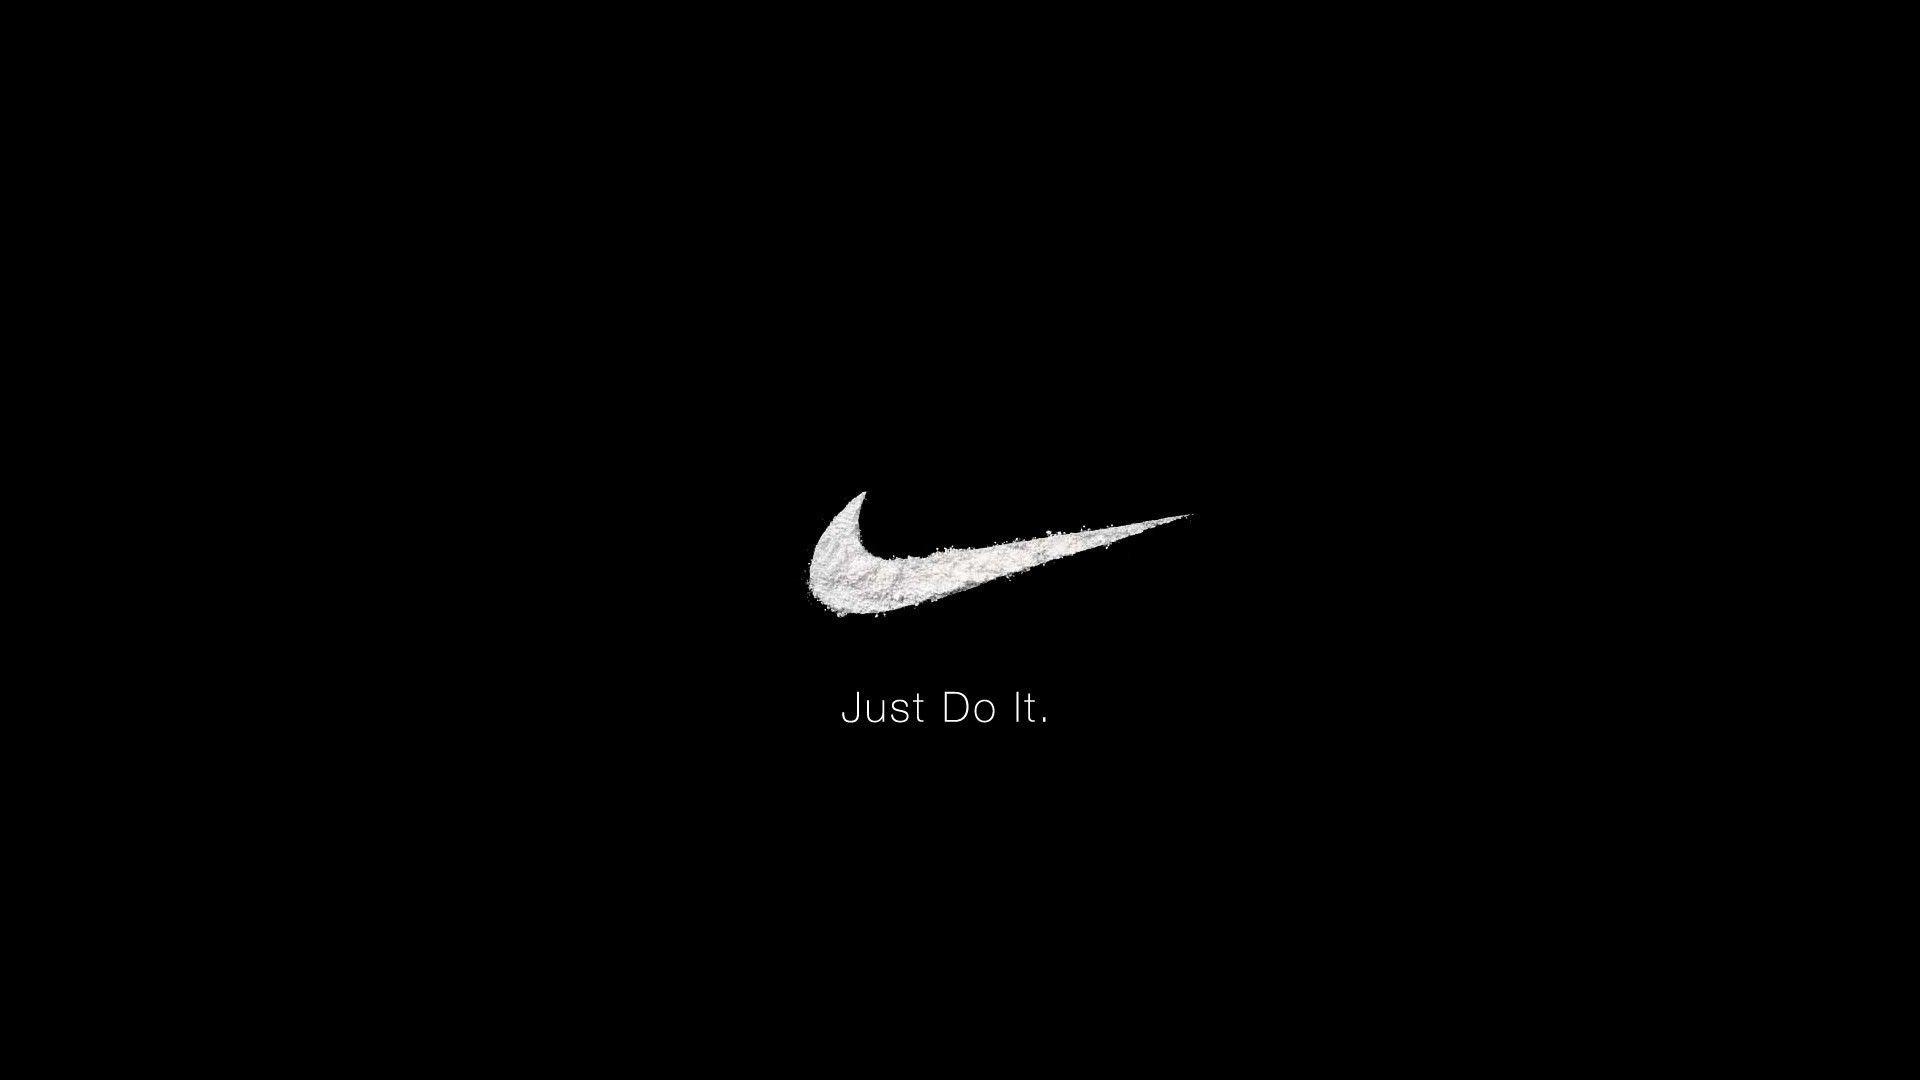 nike sb logo images | bzwallpapers.xyz | Pinterest | Logo images, Nike SB  and Logos